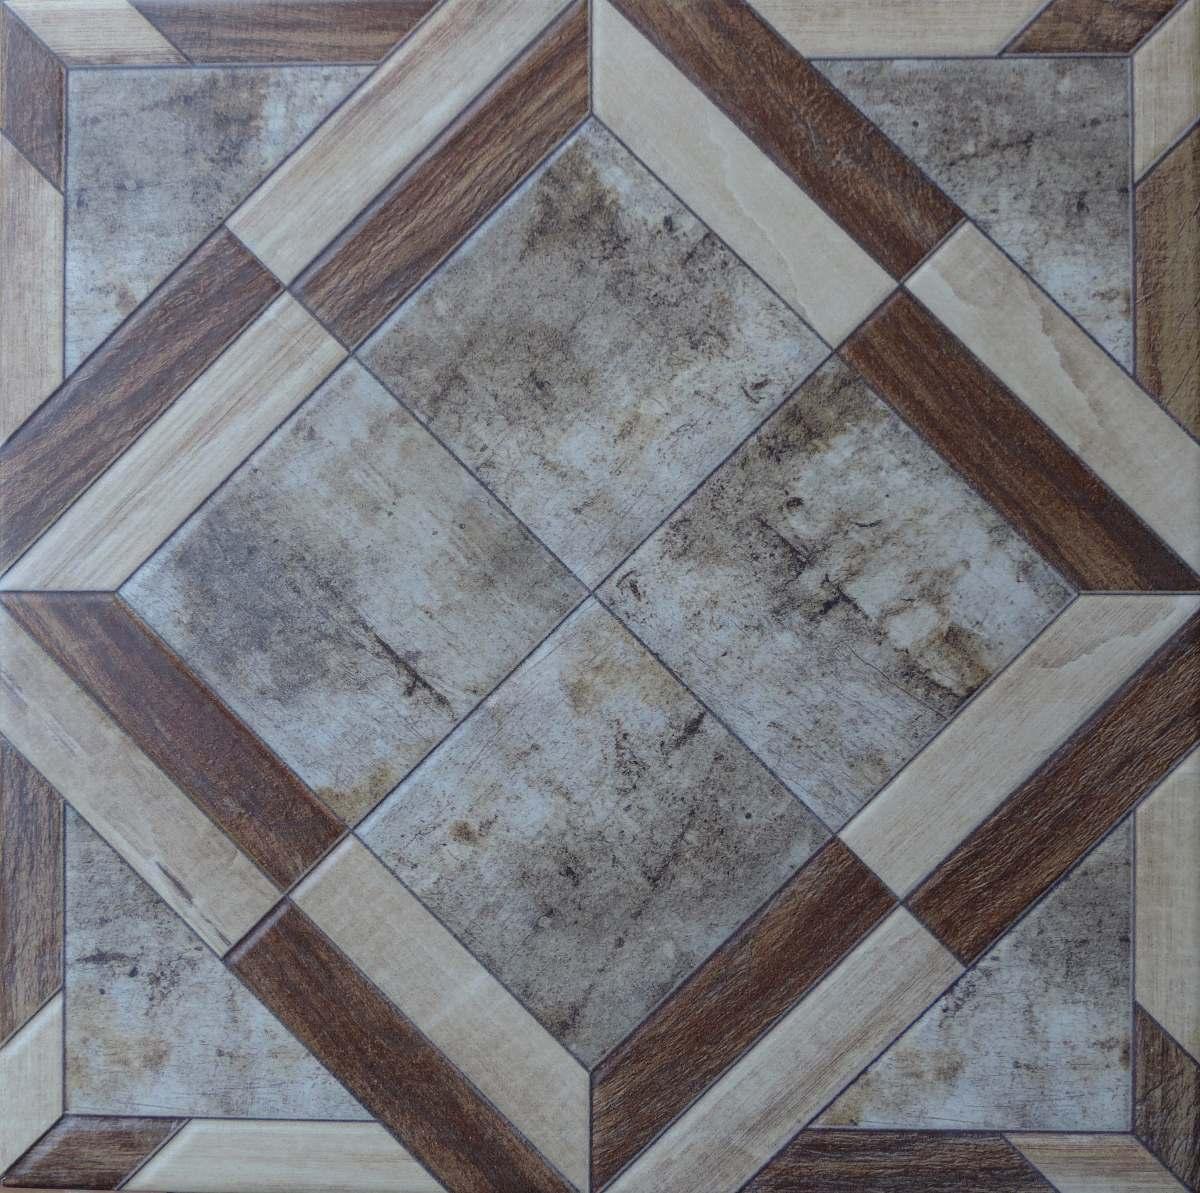 Ceramica piso interior calidad primera ceramicasuy for Donde buscar piso